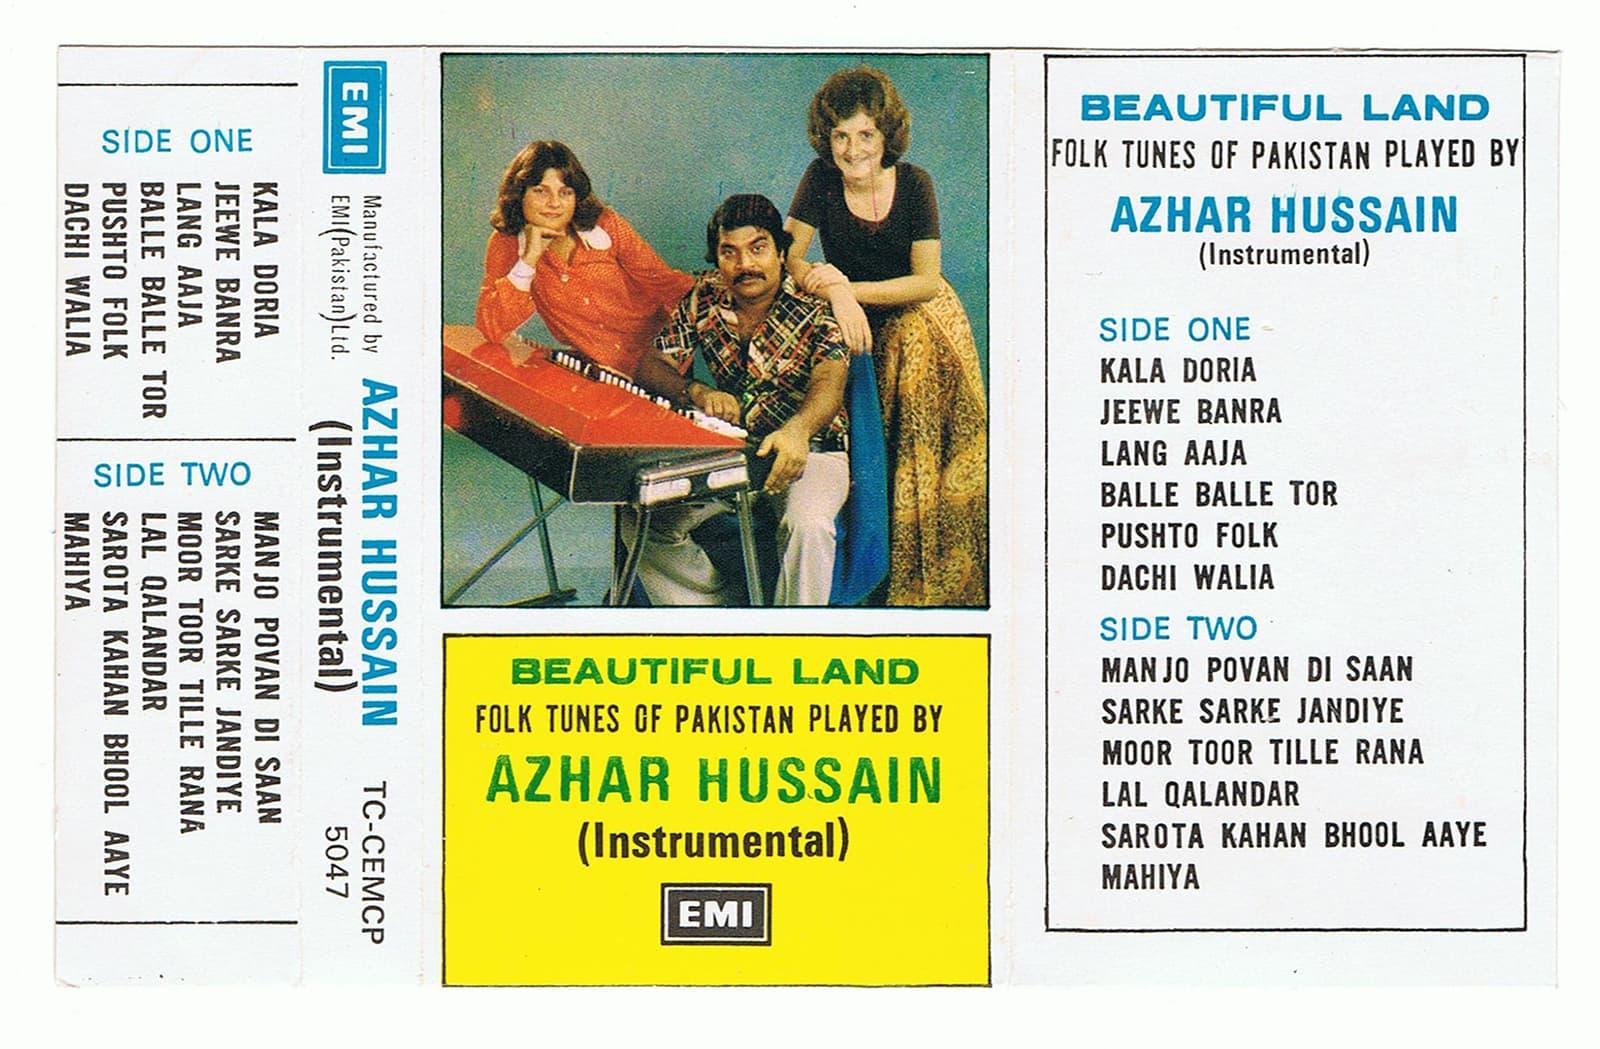 Azhar Hussain's instrumentals